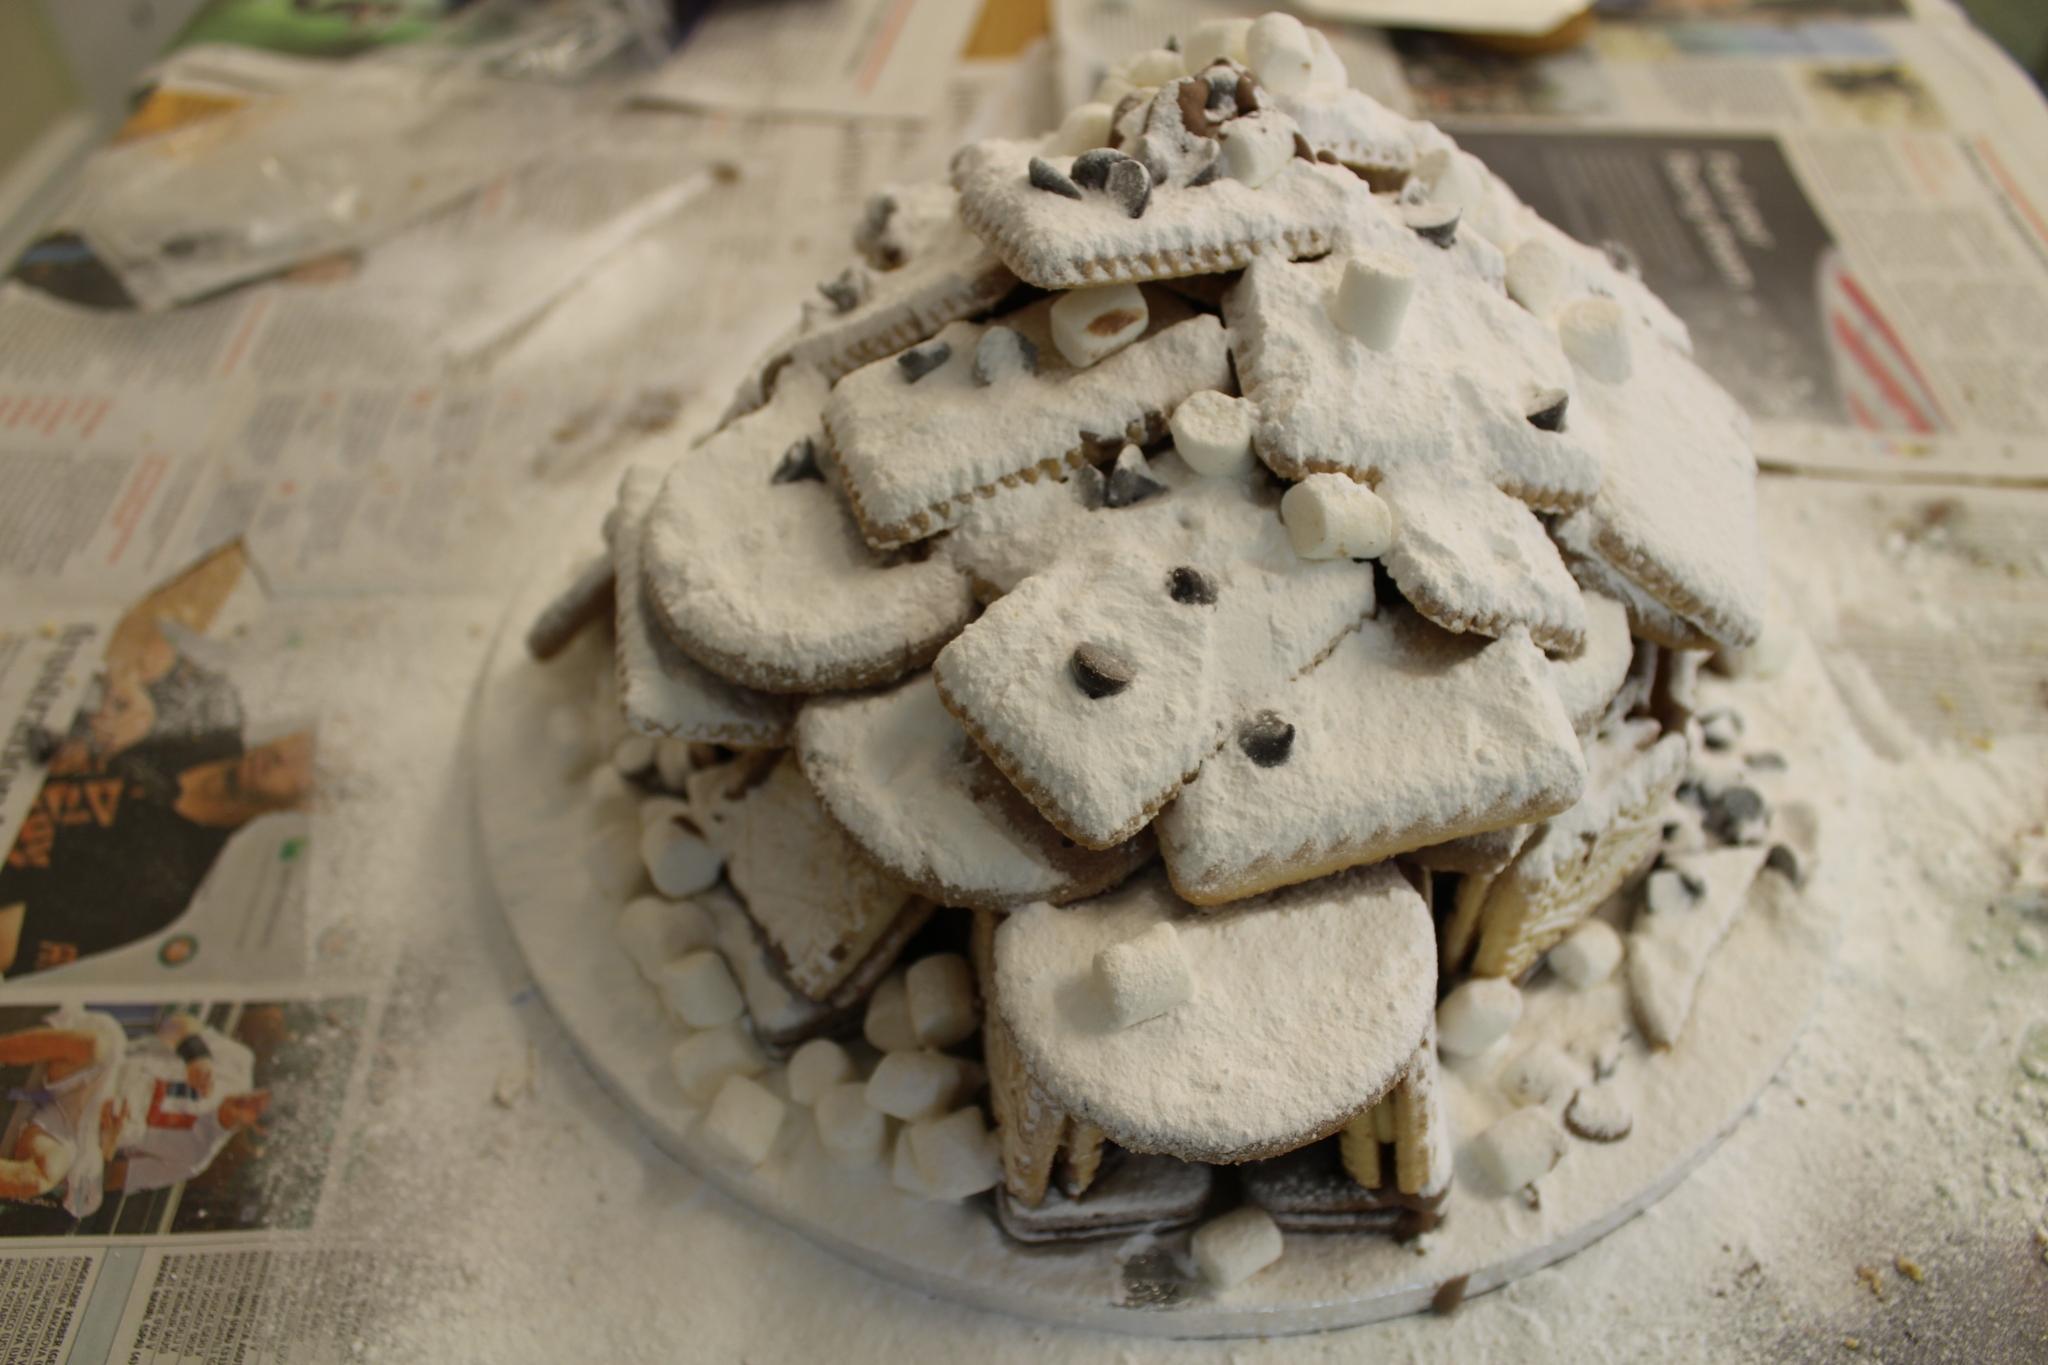 Winter holiday cake - the igloo